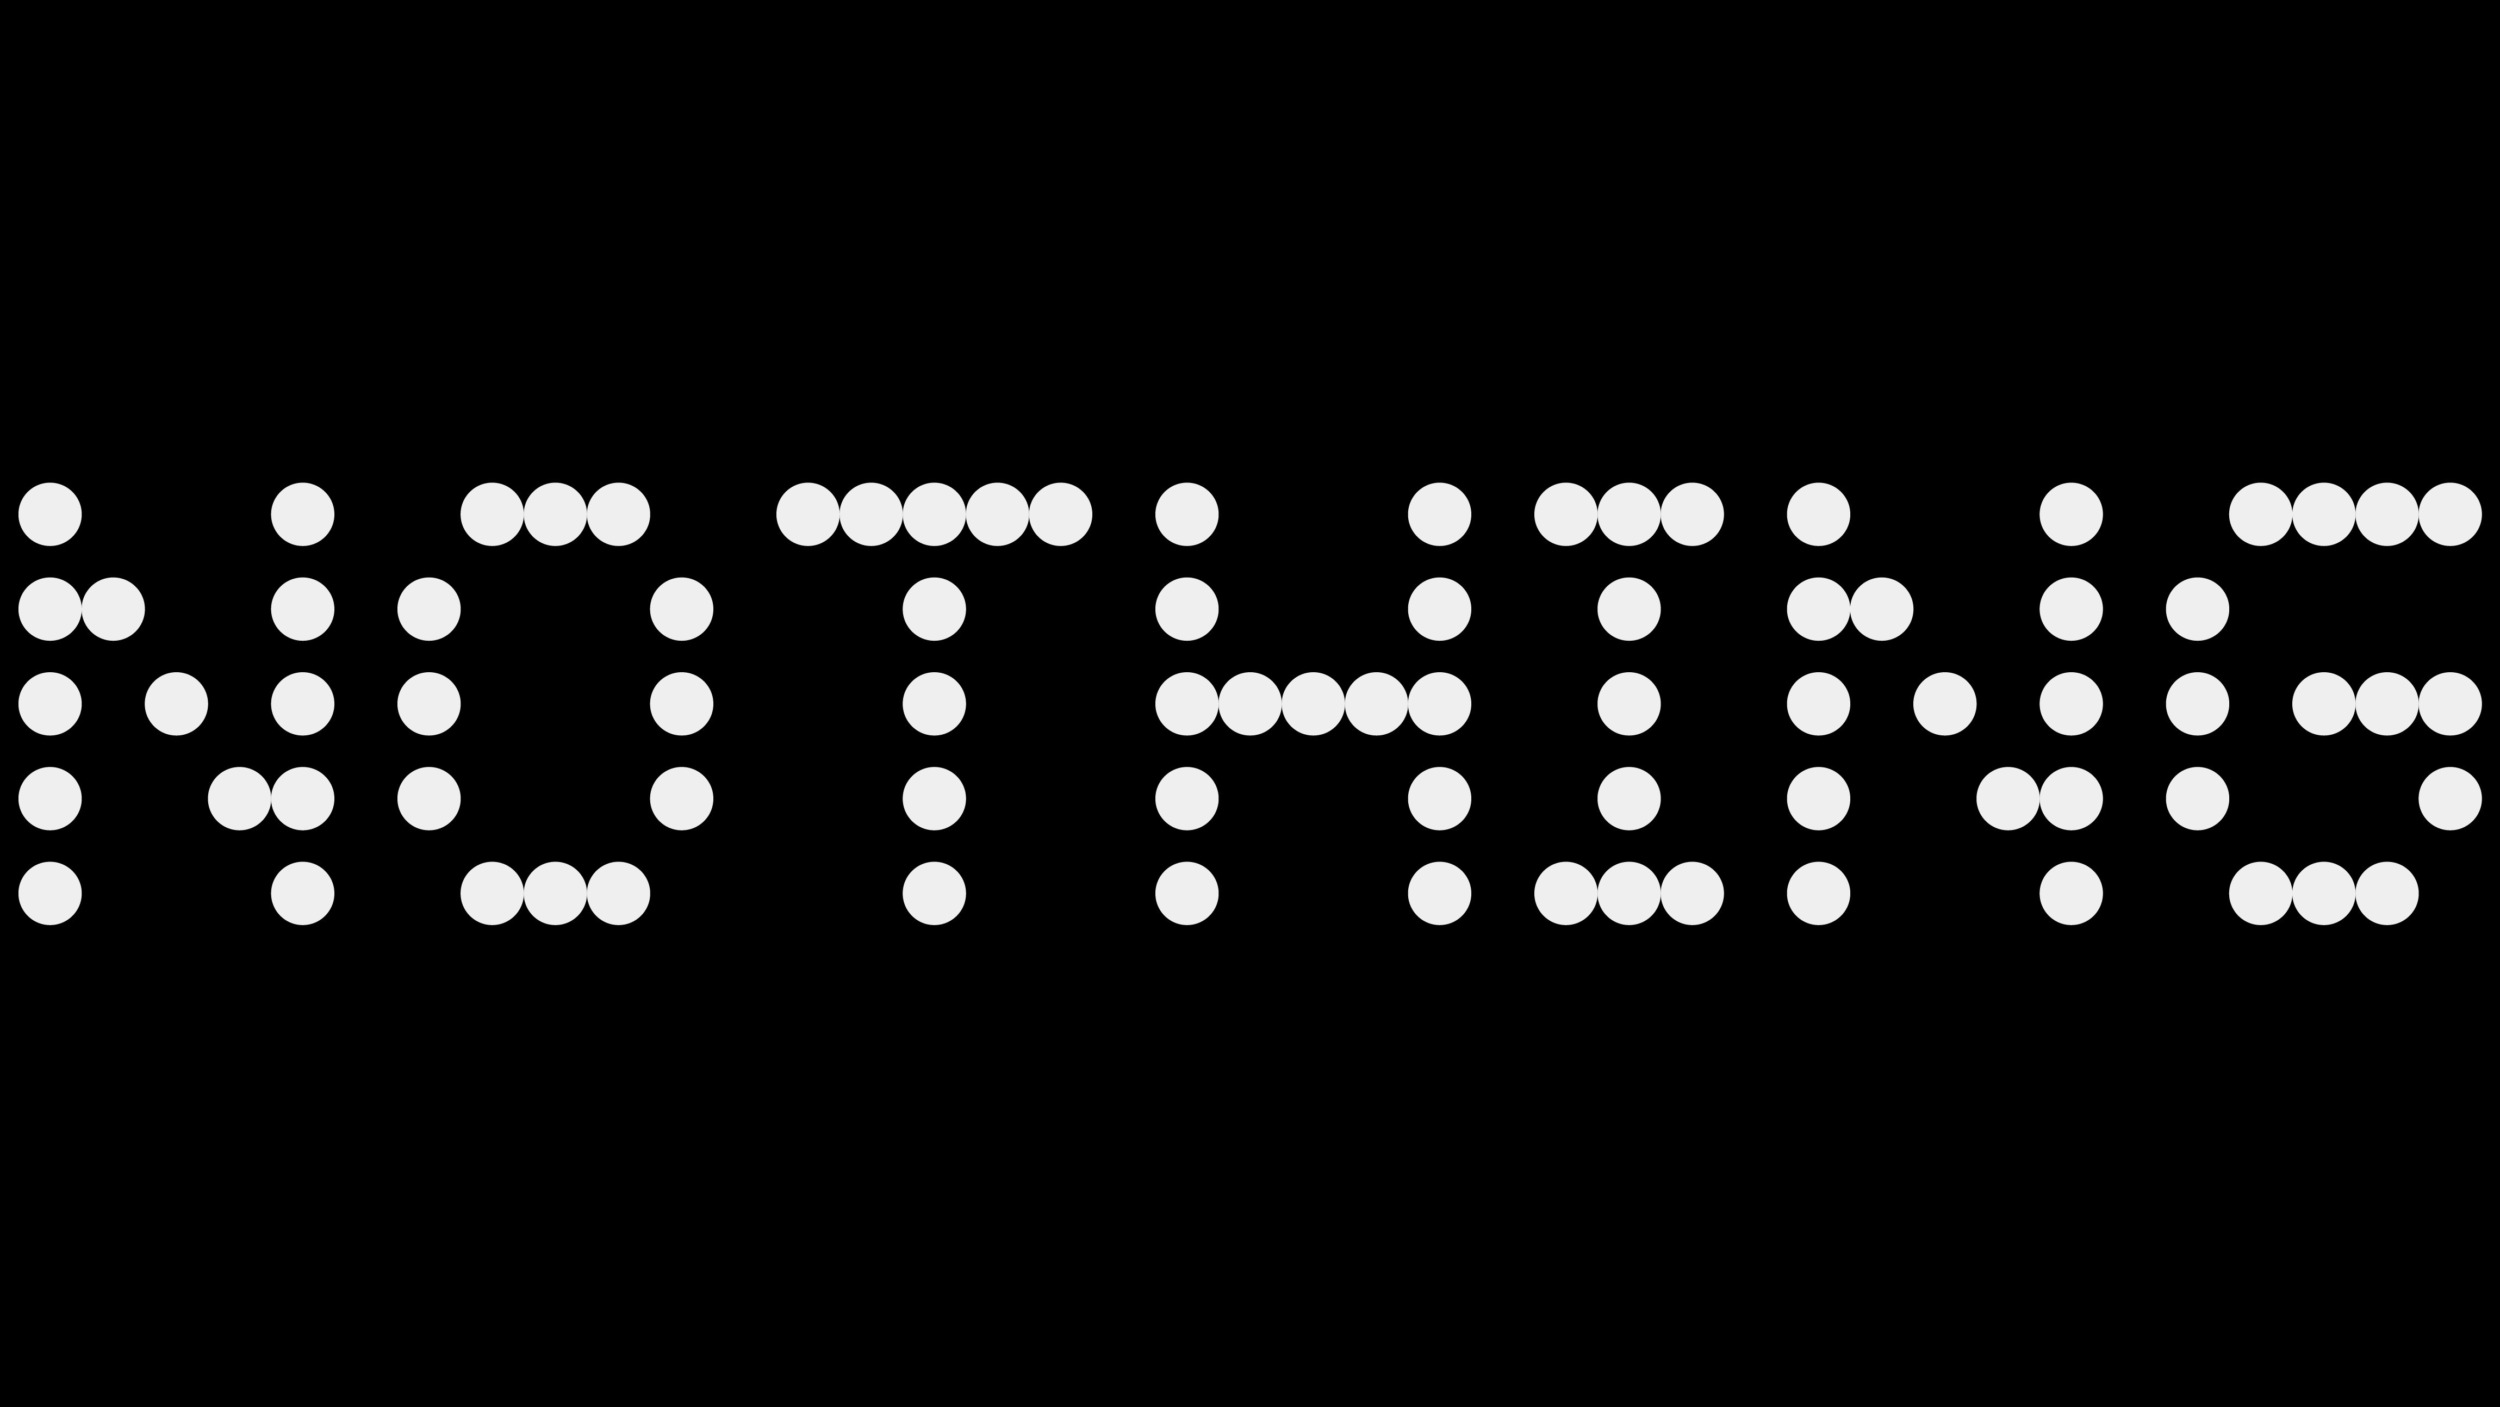 Spoluzakladatel One Plus – Carl Pei představil projekt Nothing